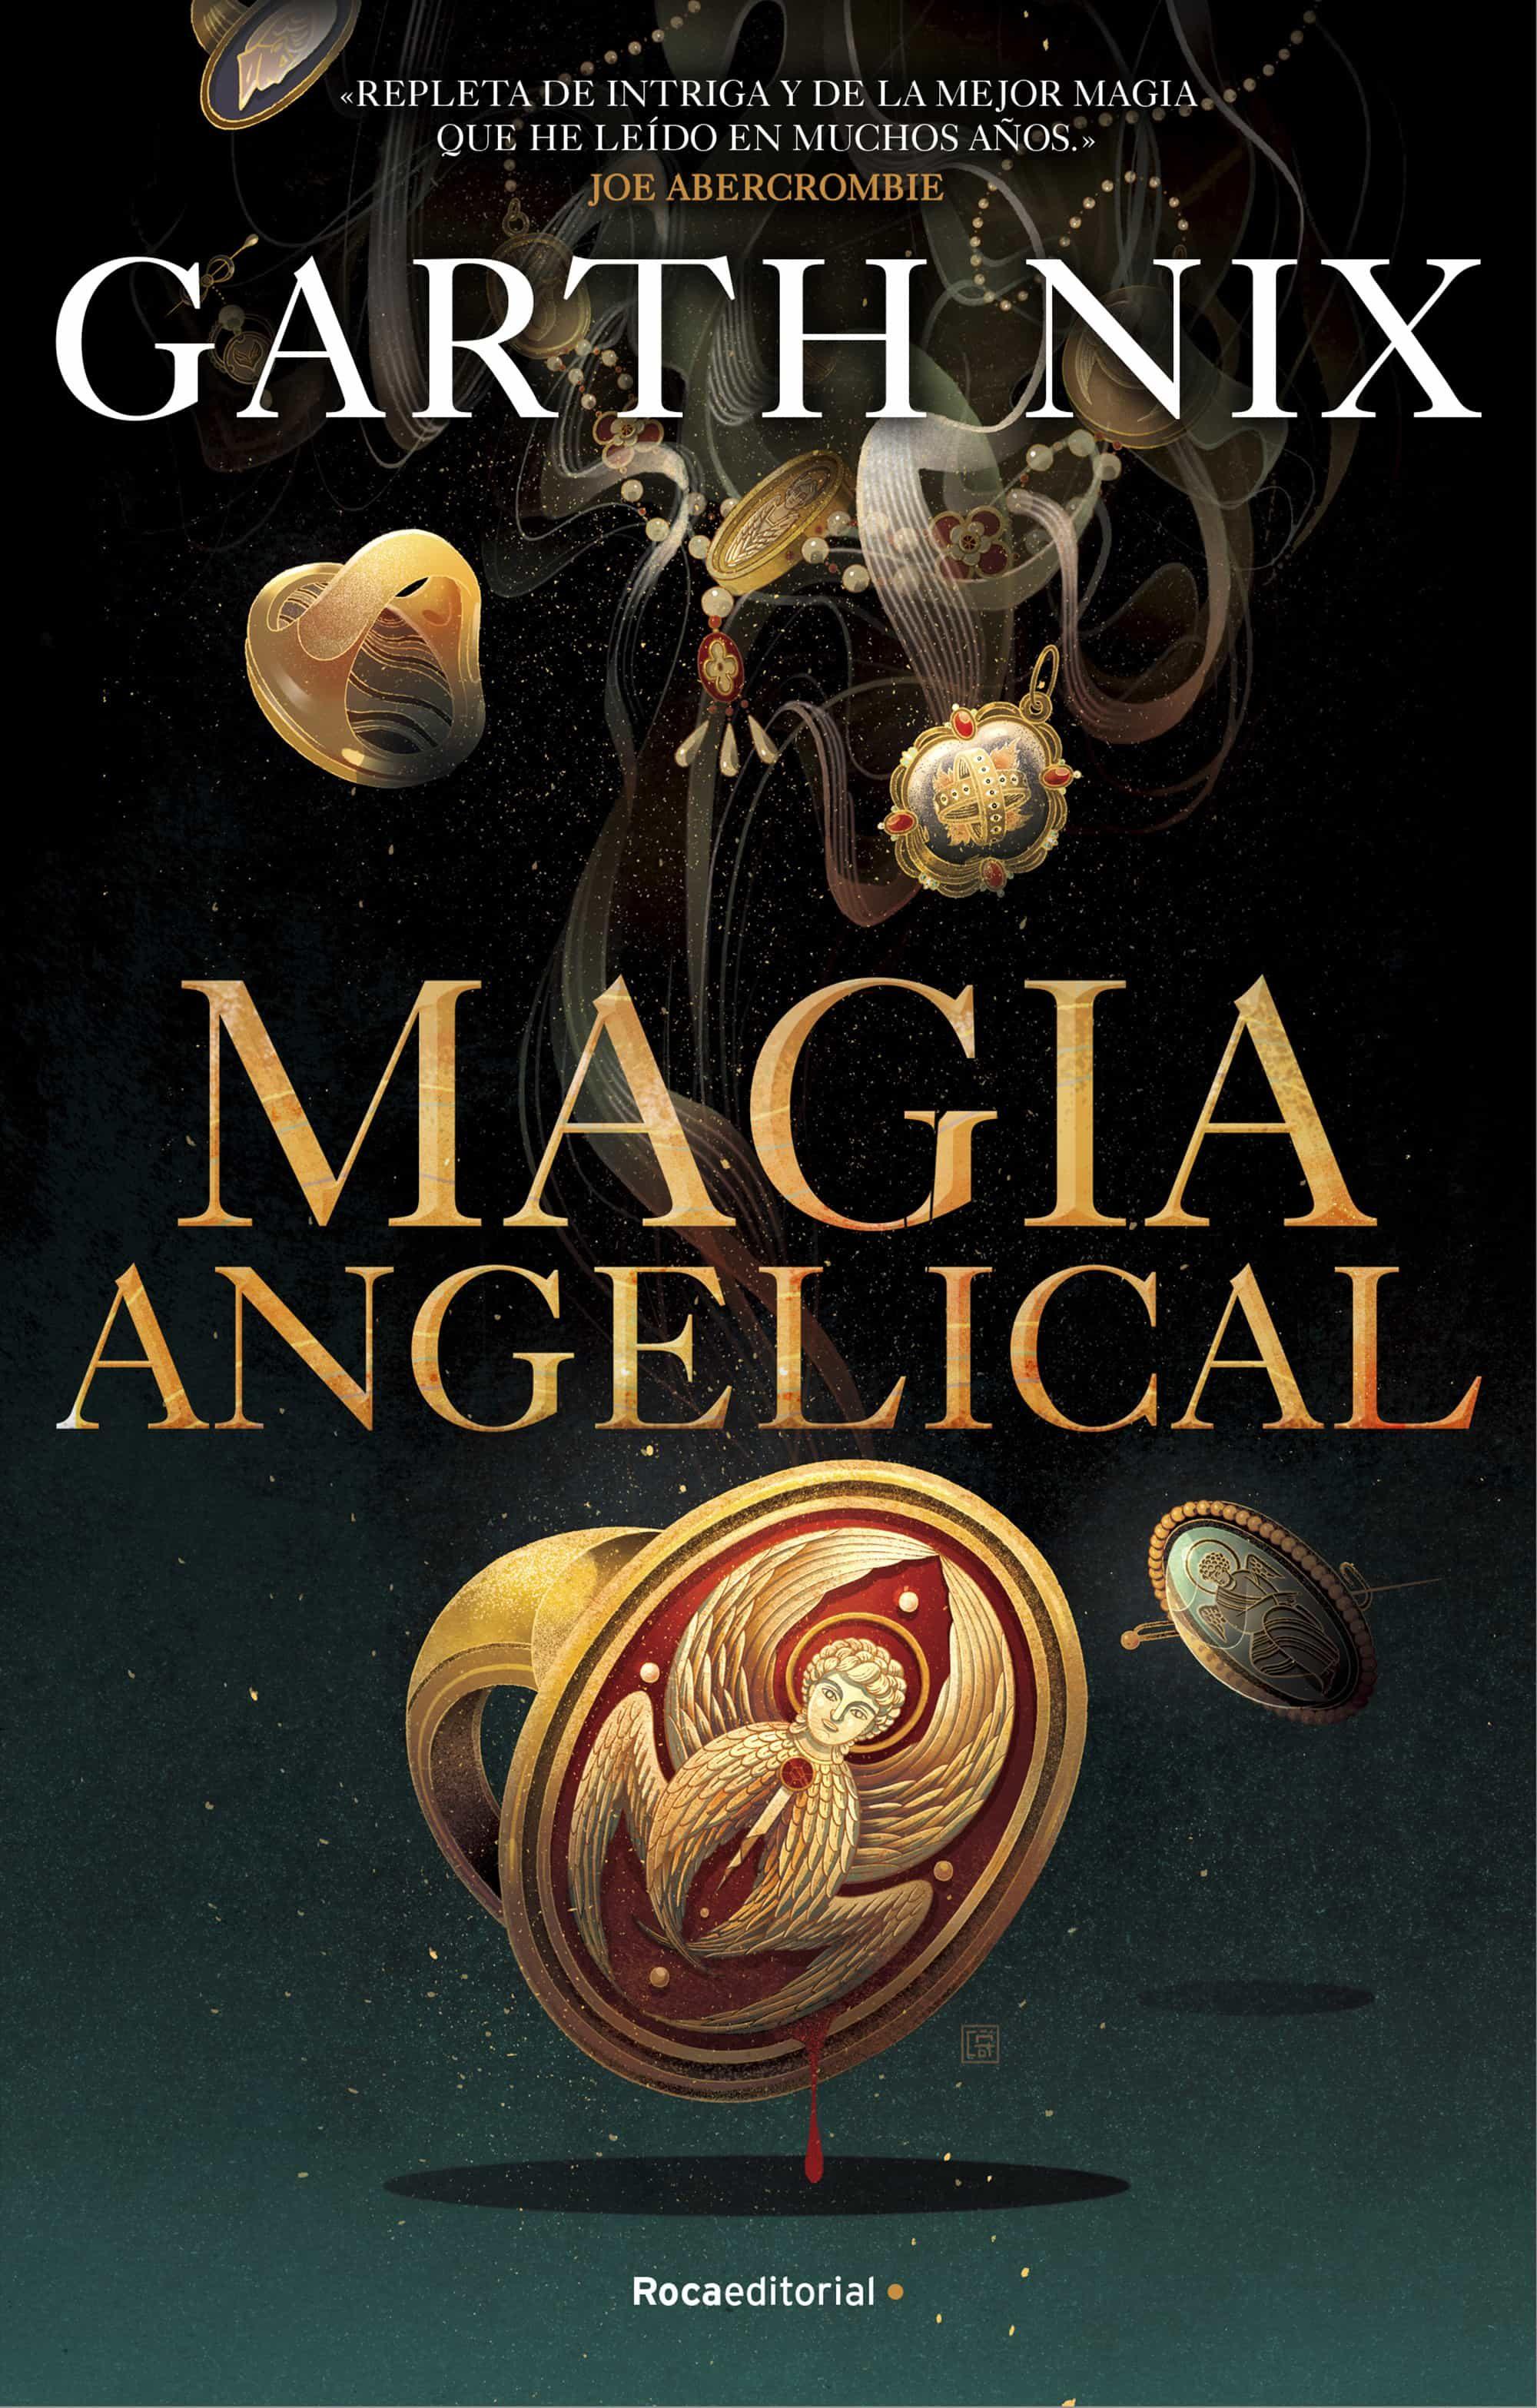 Magia Angelical Ebook Infantil 9 12 Anos Lecturas El Corte Ingles